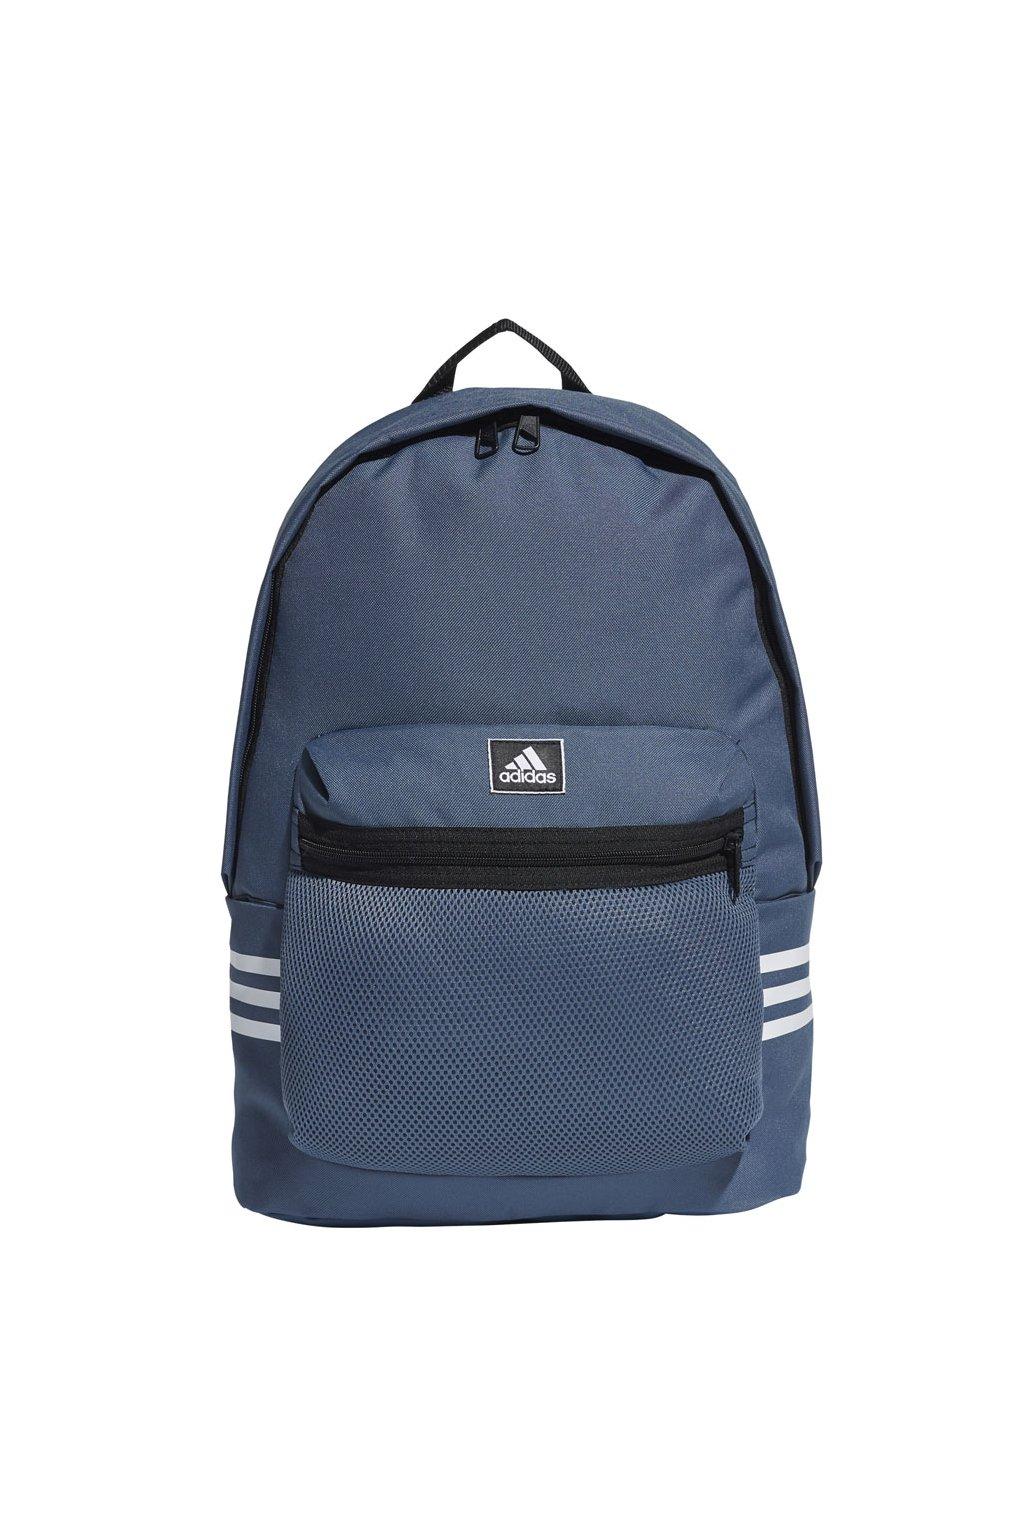 Batoh adidas Classic BP Mesh modrý GD5614